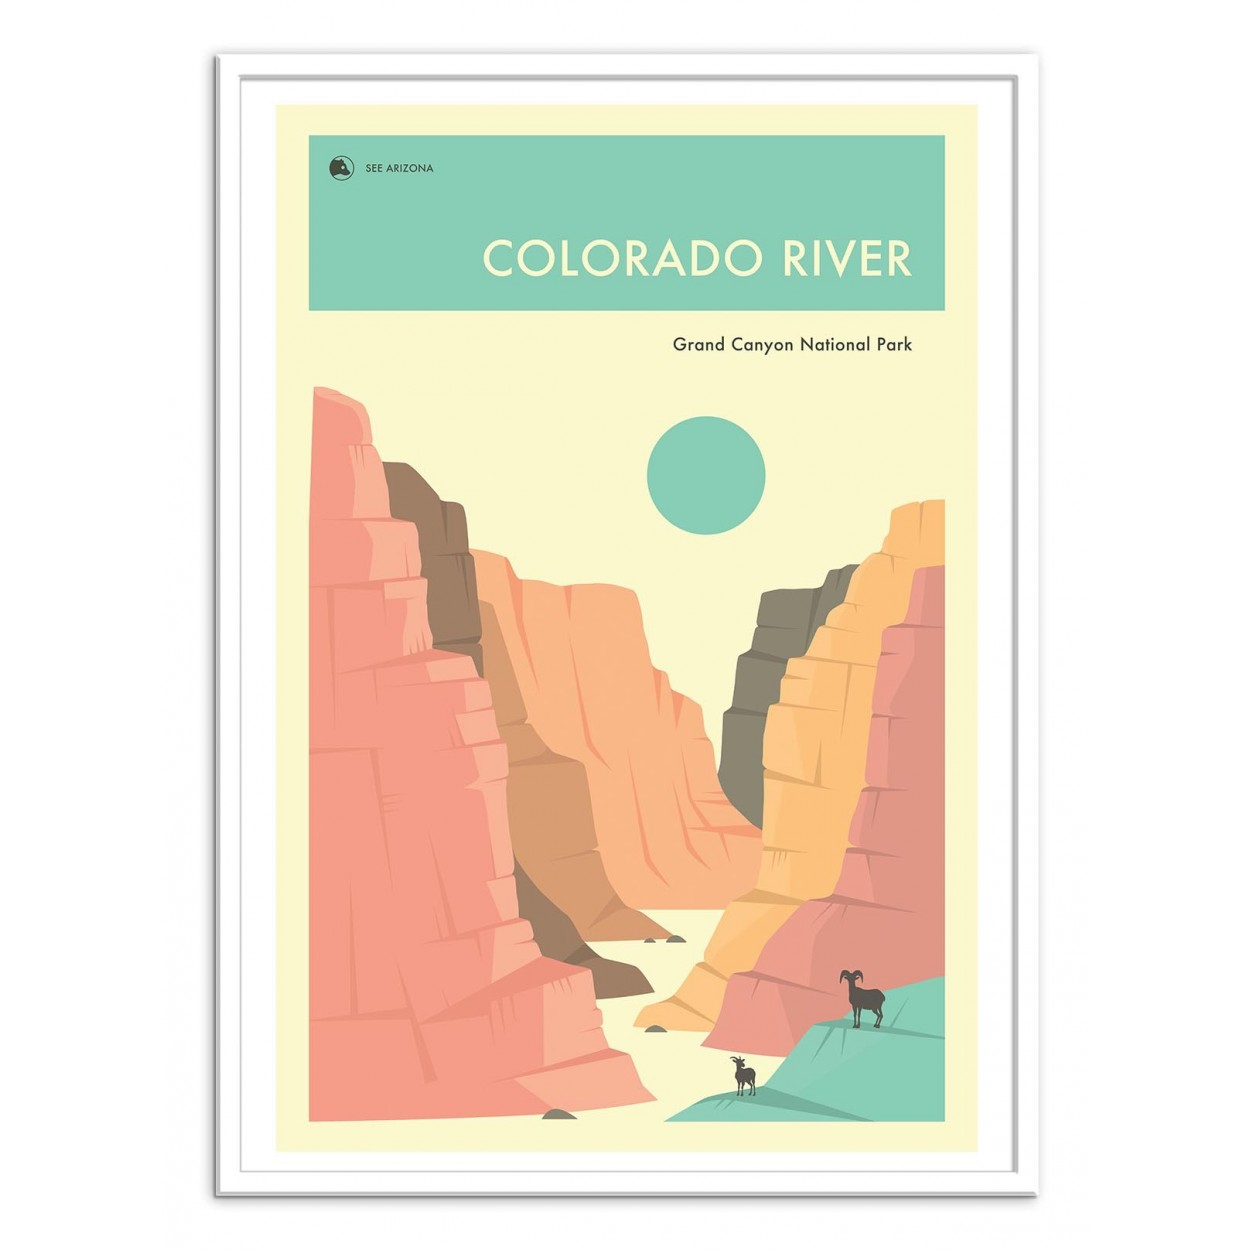 Photo, Art Poster frame and design illustration Grand Canyon Colorado